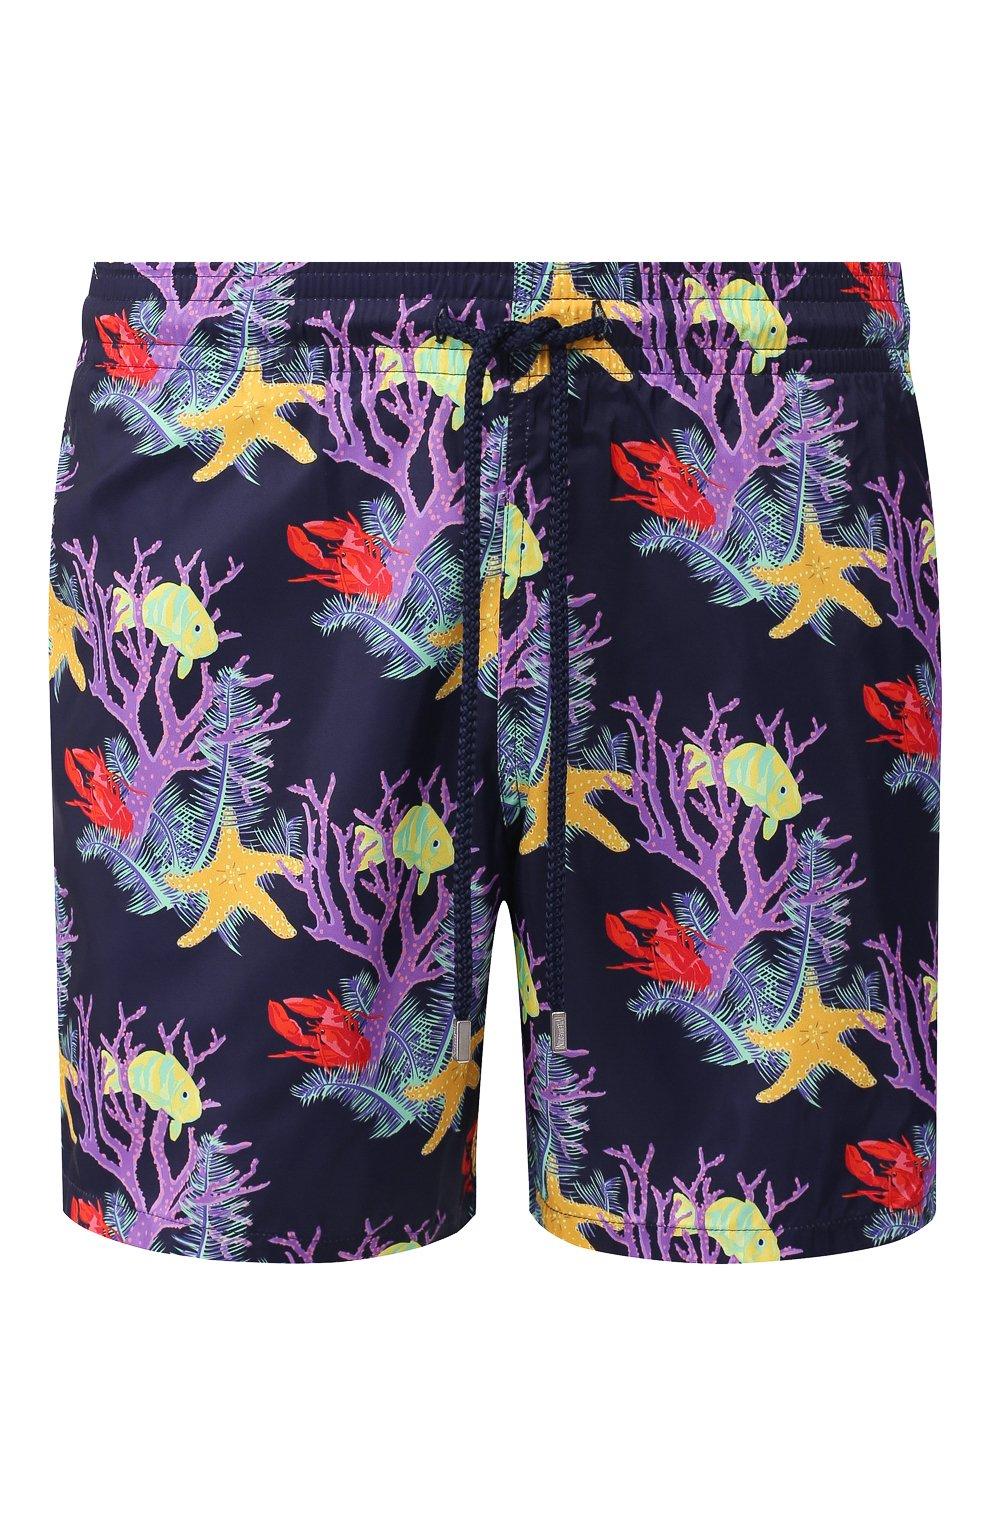 Мужские плавки-шорты VILEBREQUIN фиолетового цвета, арт. MAHU0J02 | Фото 1